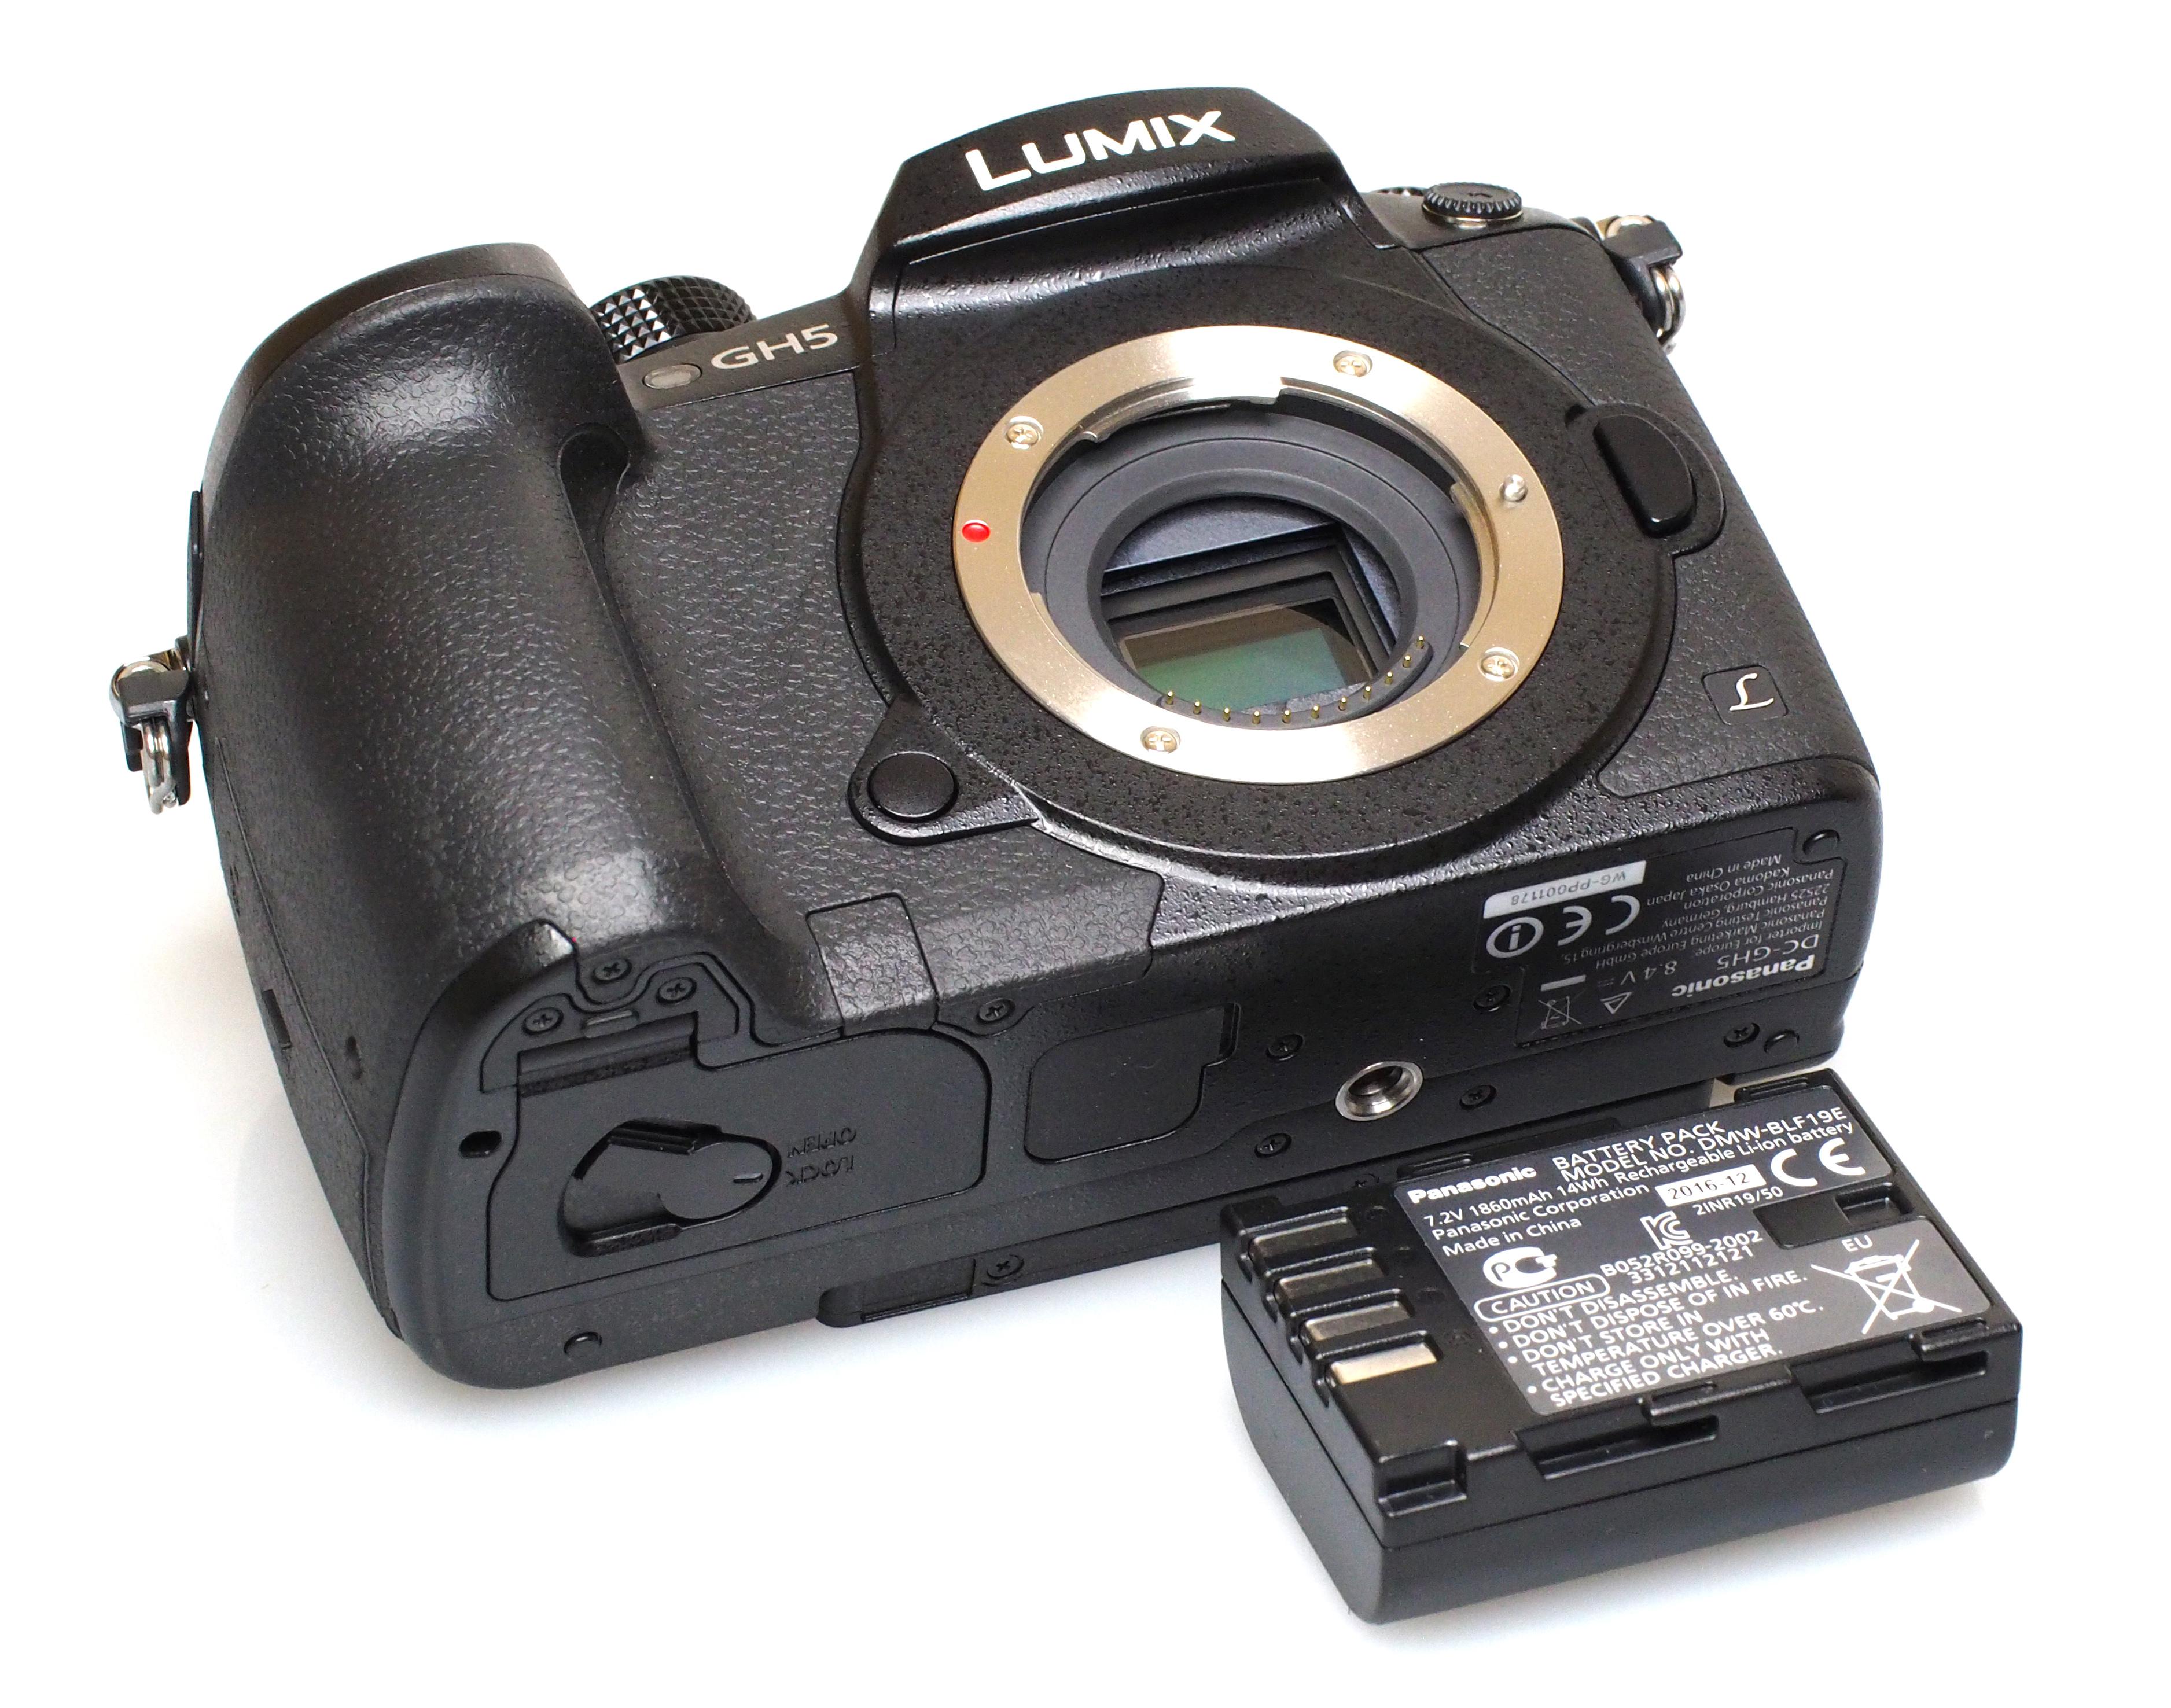 Panasonic Lumix GH5 Expert Review | ePHOTOzine